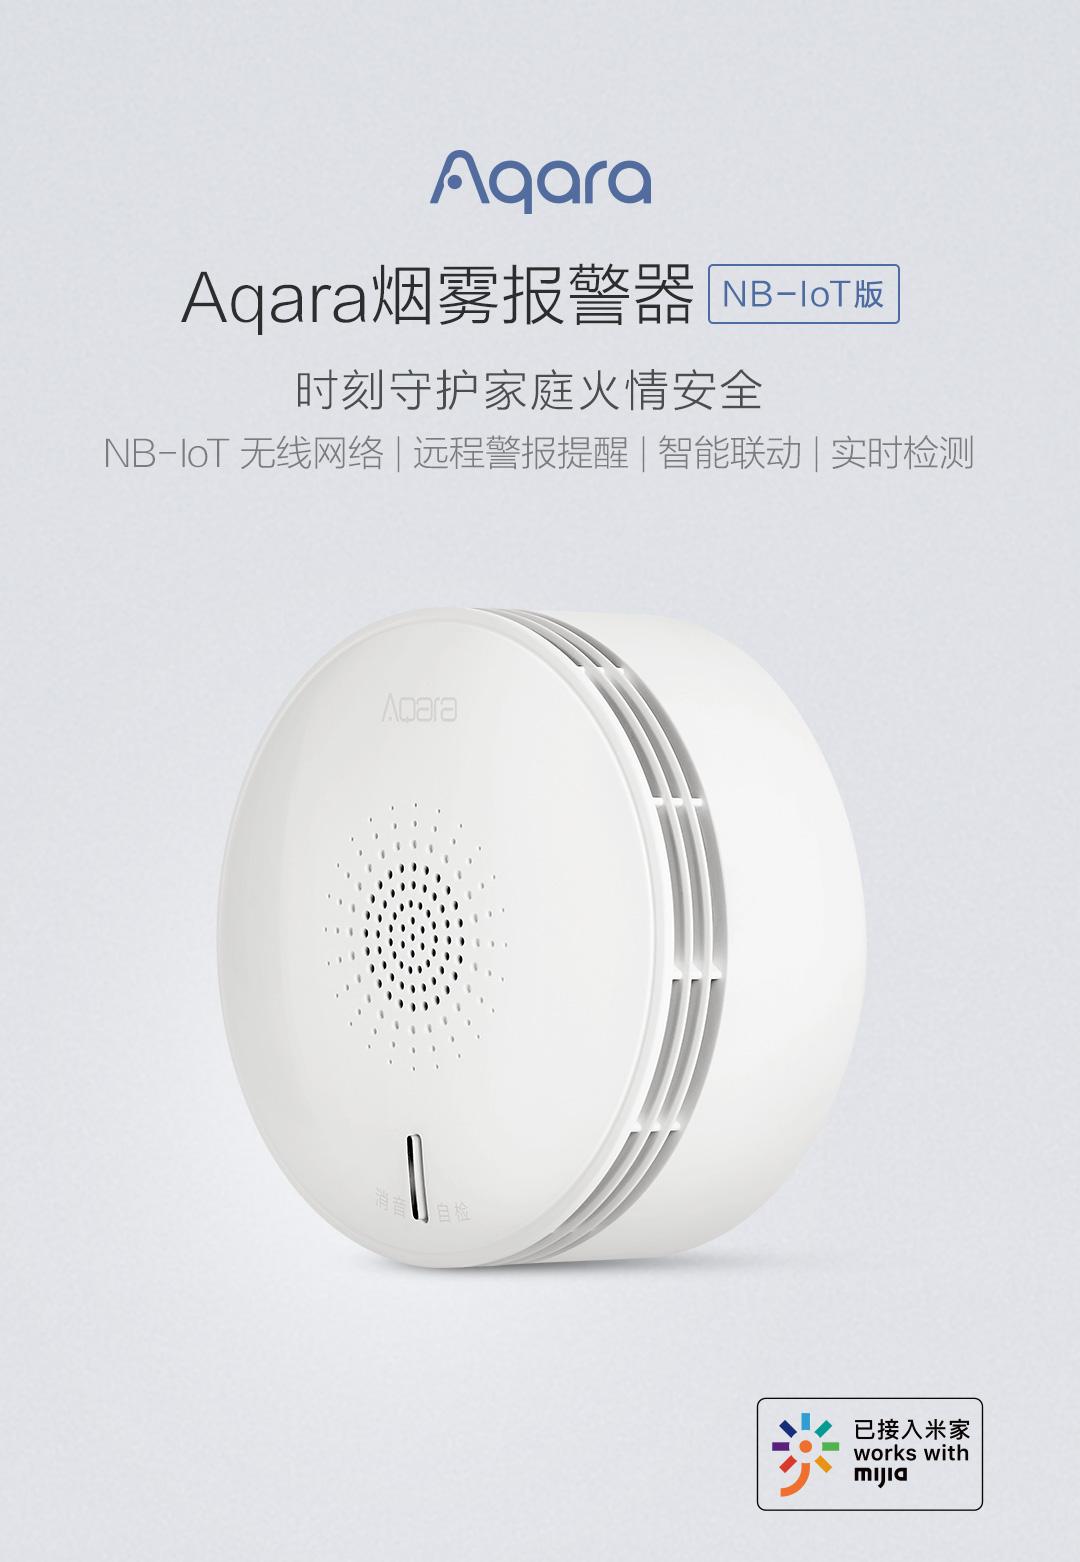 Aqara 烟雾报警器 NB-IoT版